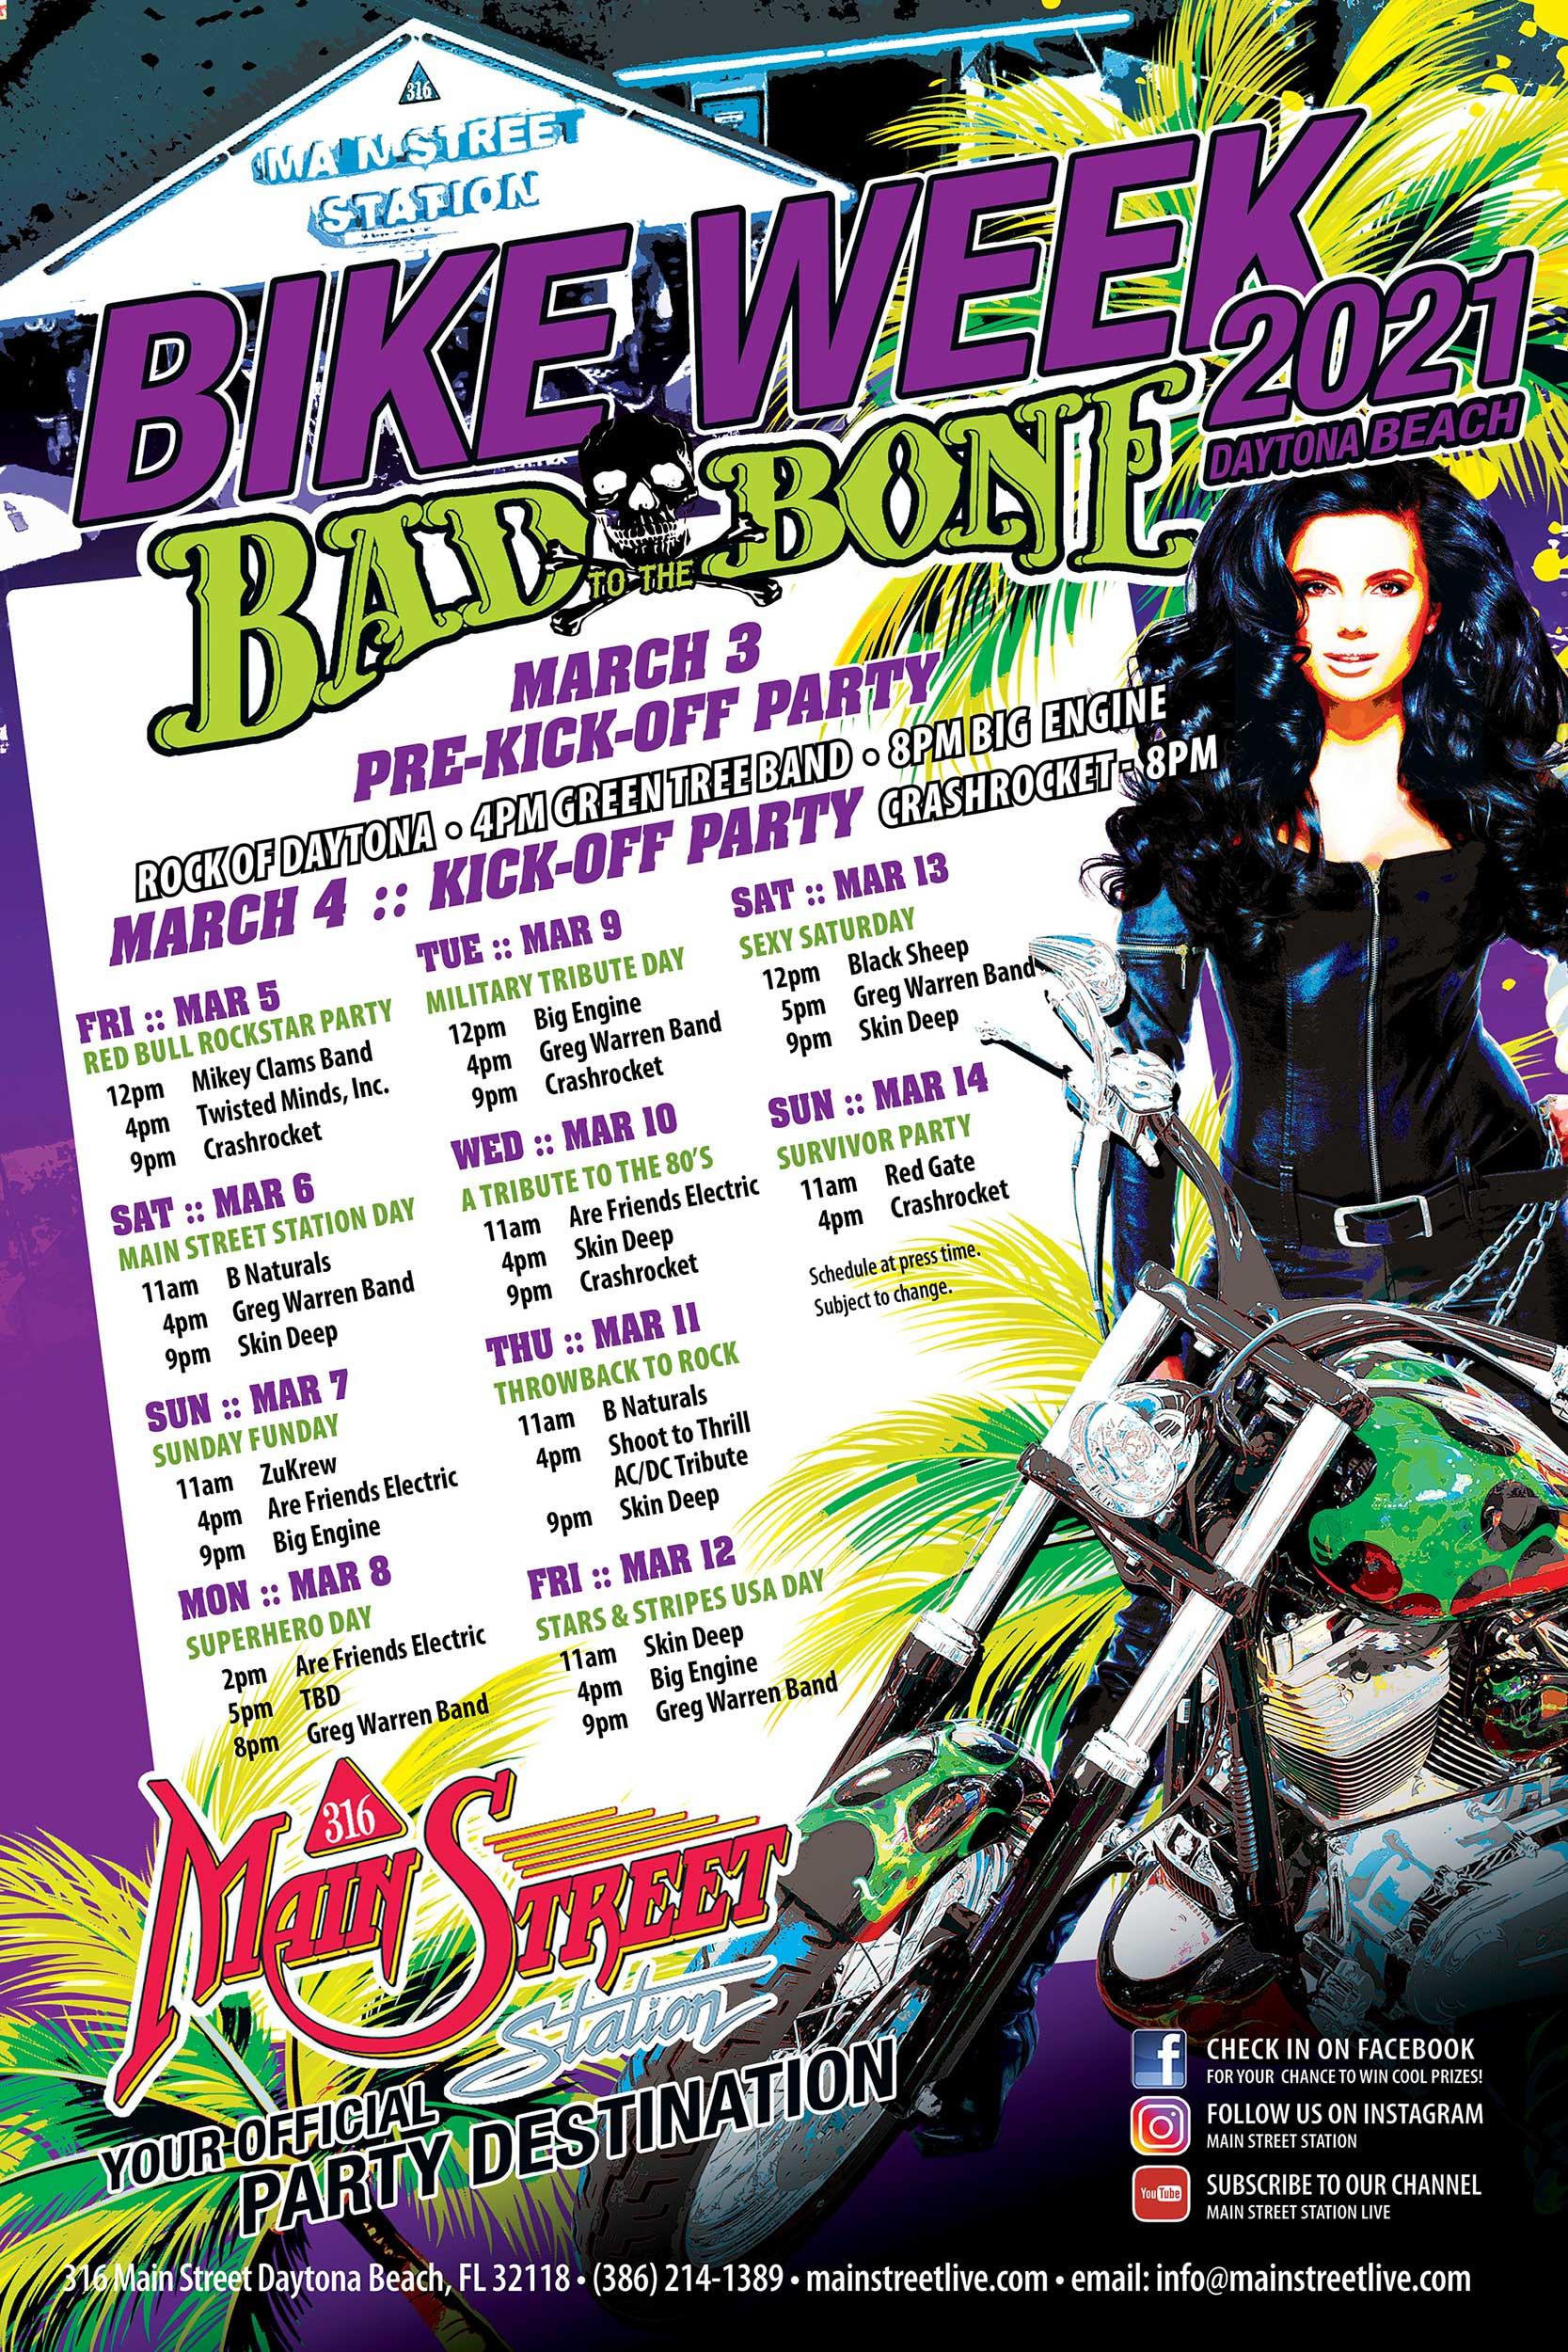 bike week daytona beach 2021 live music 316 main street station